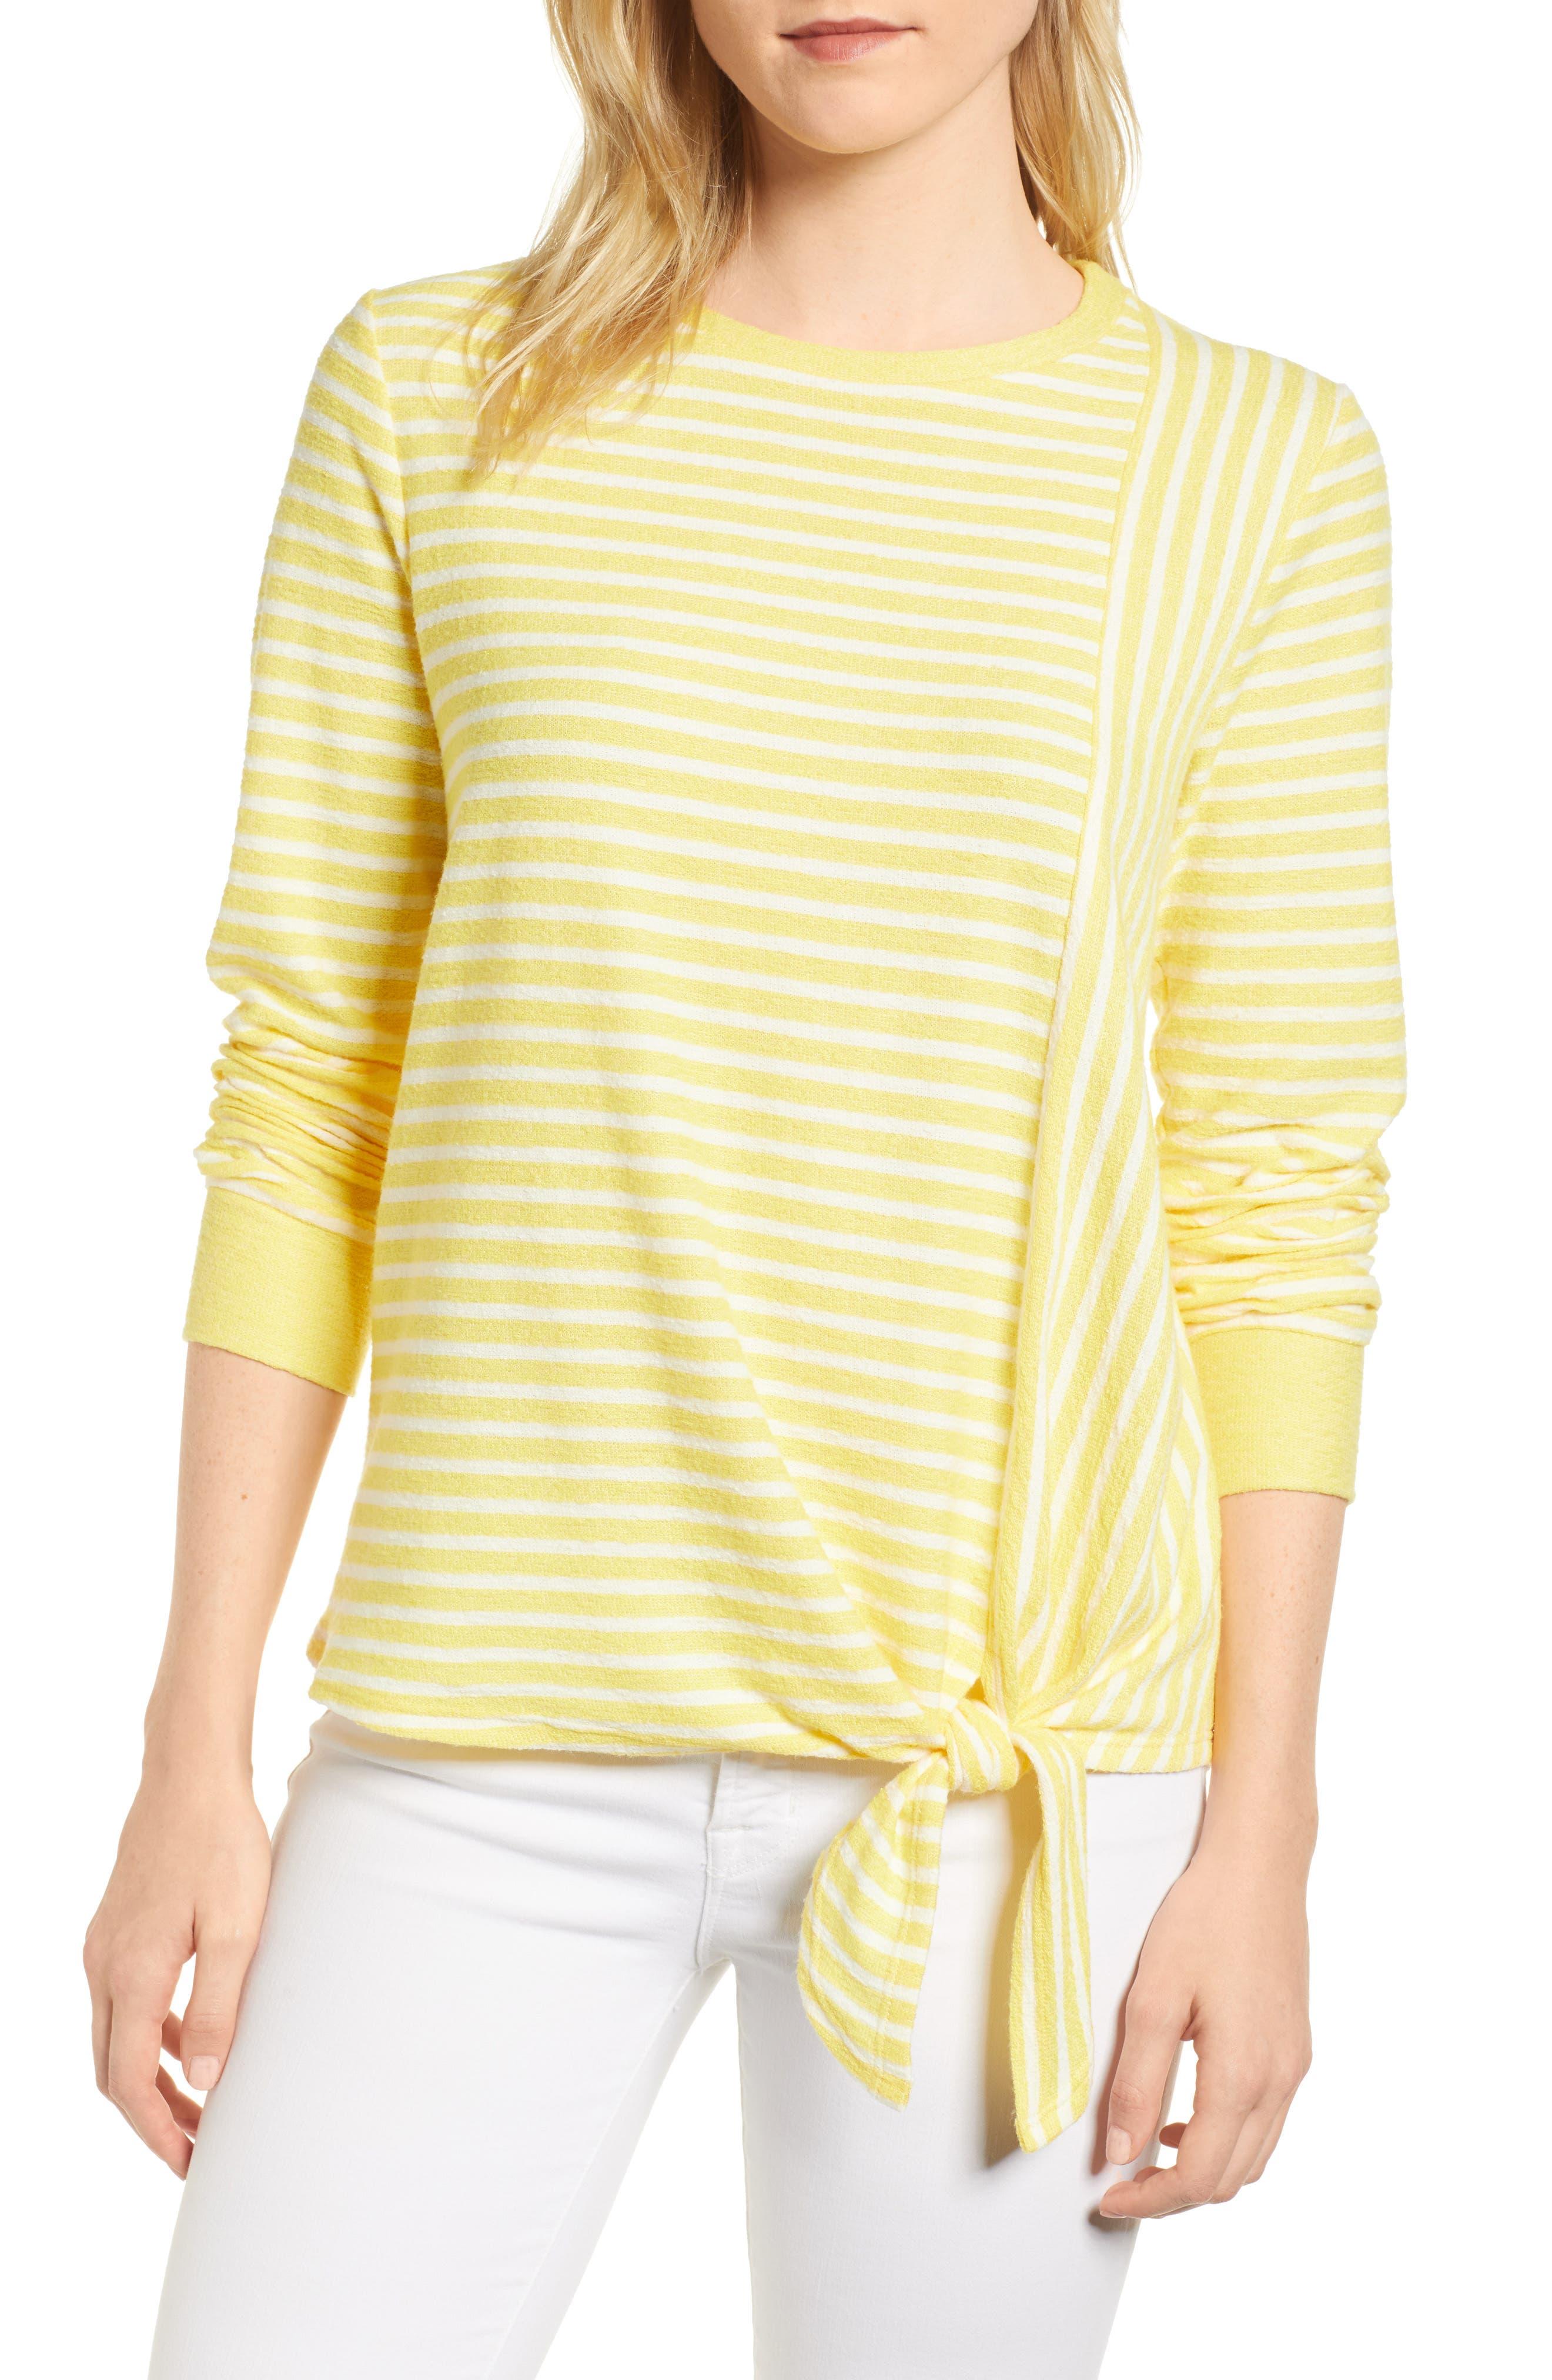 Tie Front Stripe Top,                             Main thumbnail 1, color,                             Yellow/ White Stripe